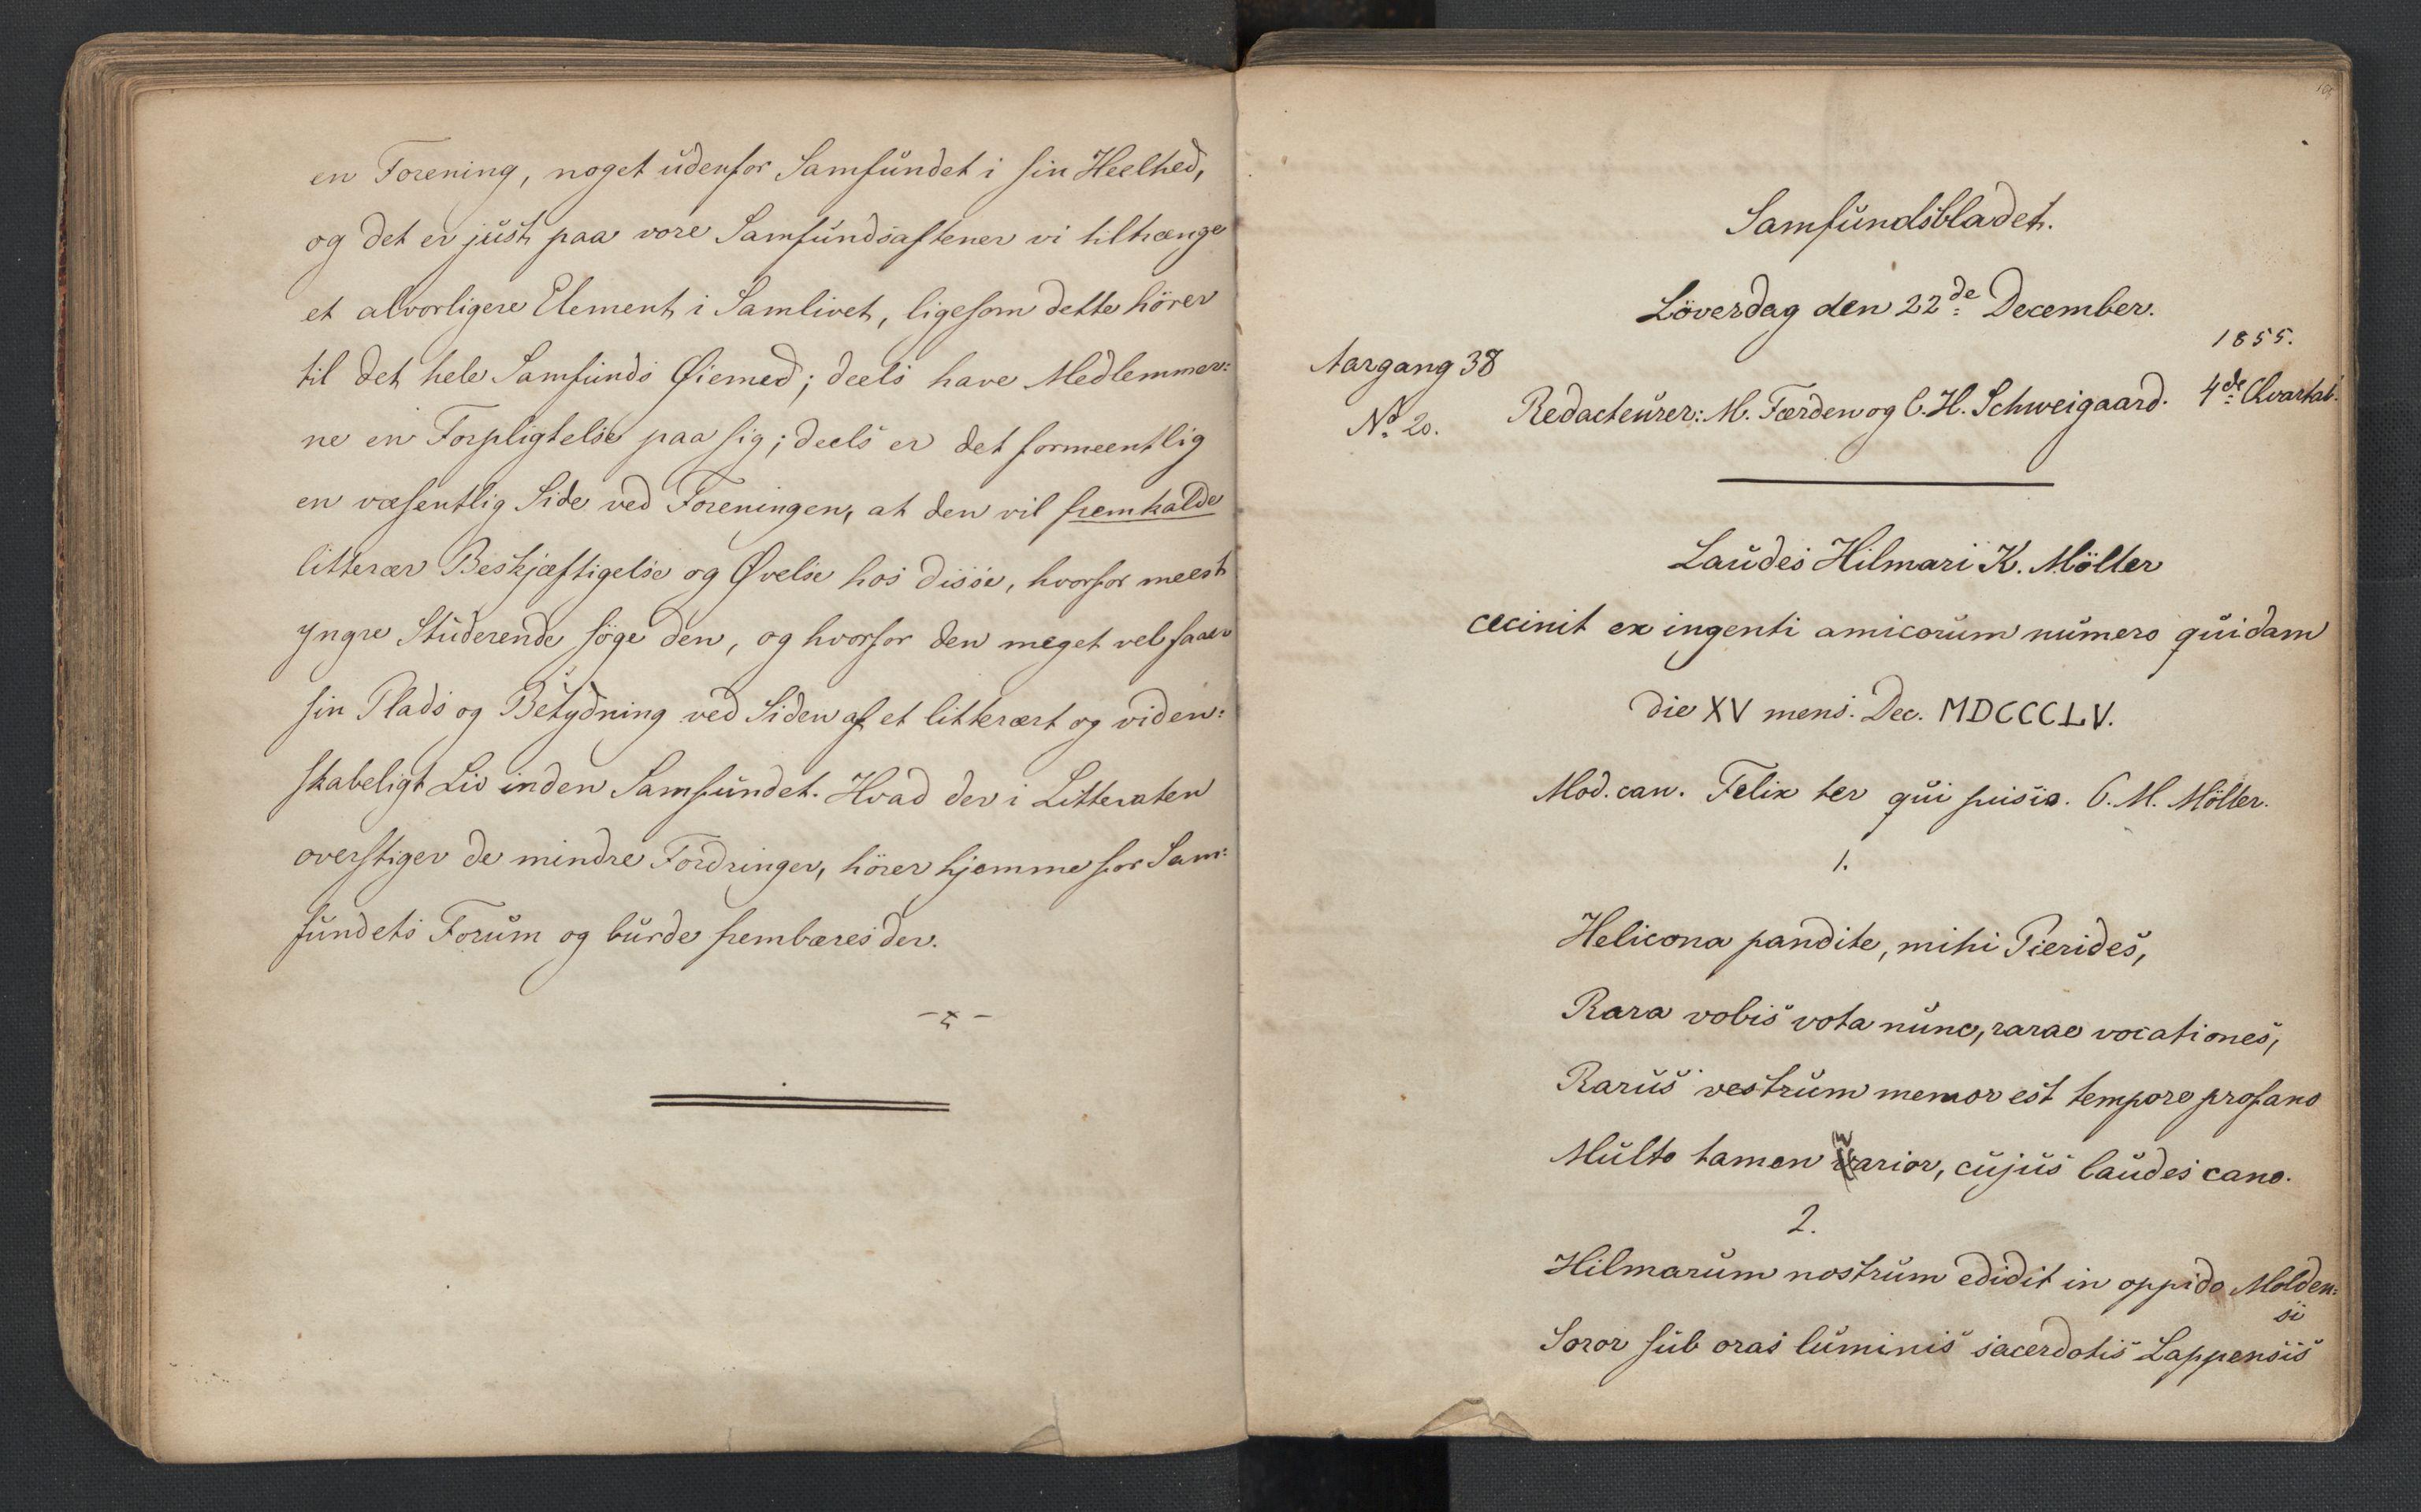 RA, Det Norske Studentersamfund, X/Xa/L0005, 1855-1856, s. 84